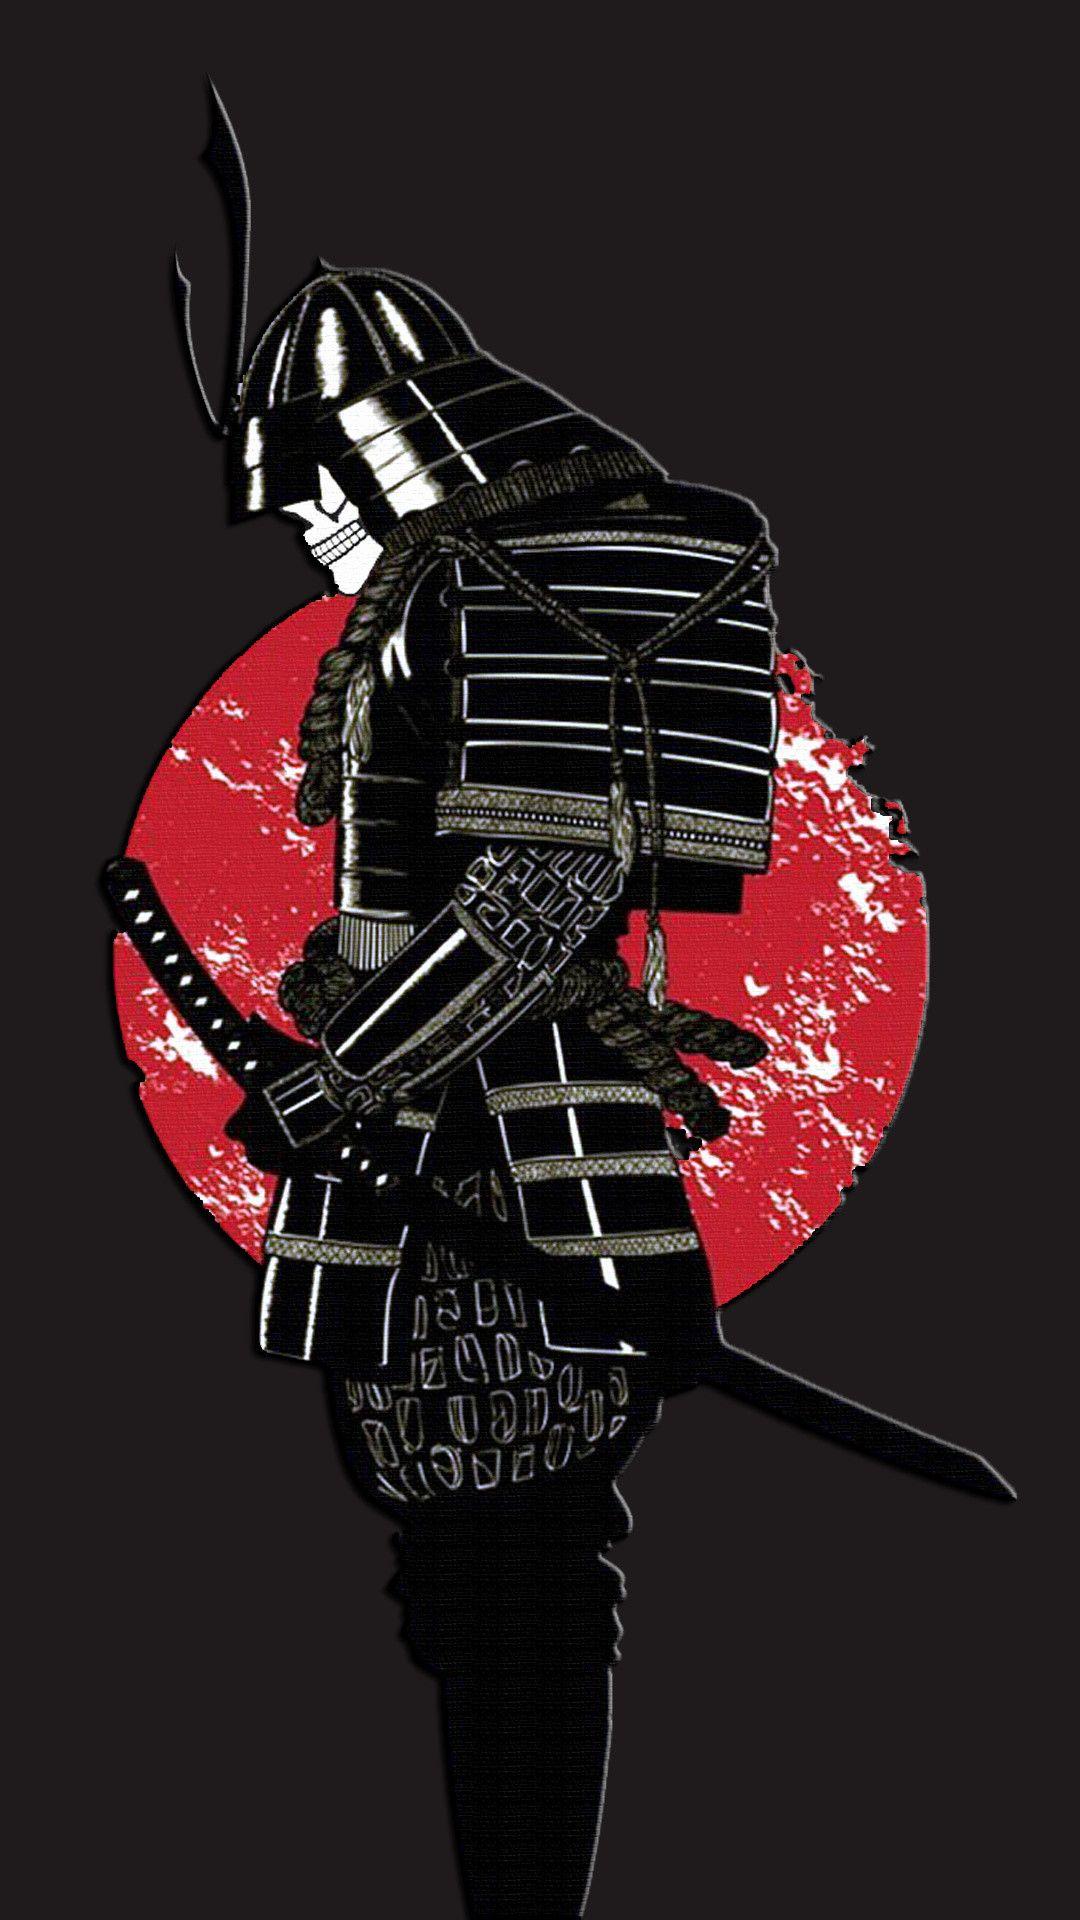 4k Anime Samurai Wallpapers Posted By Ryan Johnson